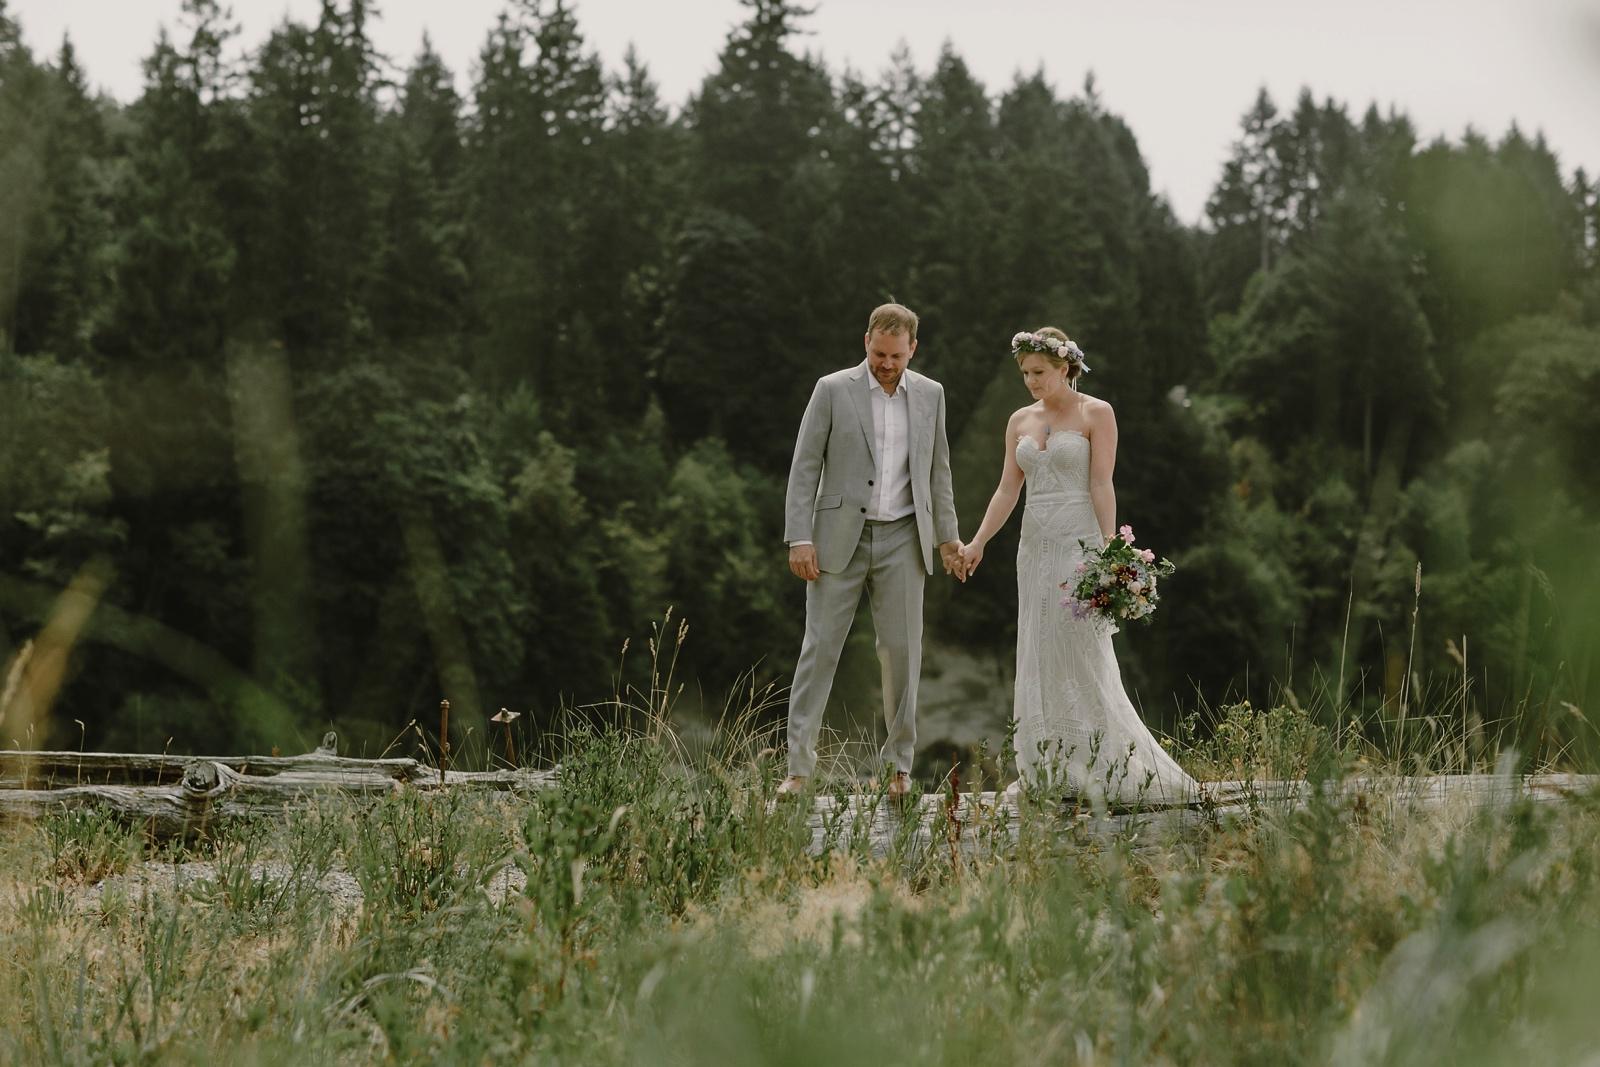 Backyard_Vashon_Island_Wedding_Kristen_Marie_Parker023.JPG